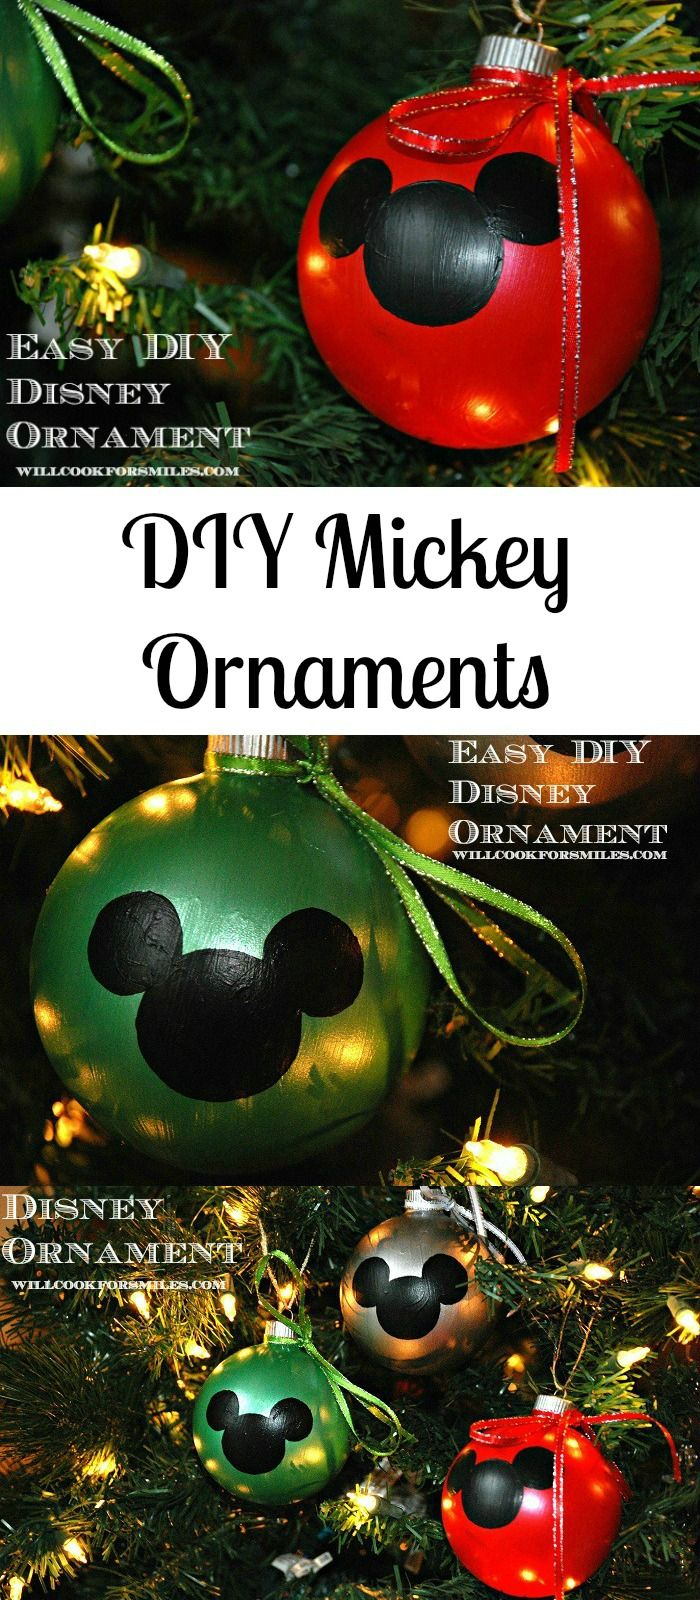 Diy disney christmas decorations disney ornaments ornament and easy diy disney christmas decorations christmas do it yourself solutioingenieria Choice Image